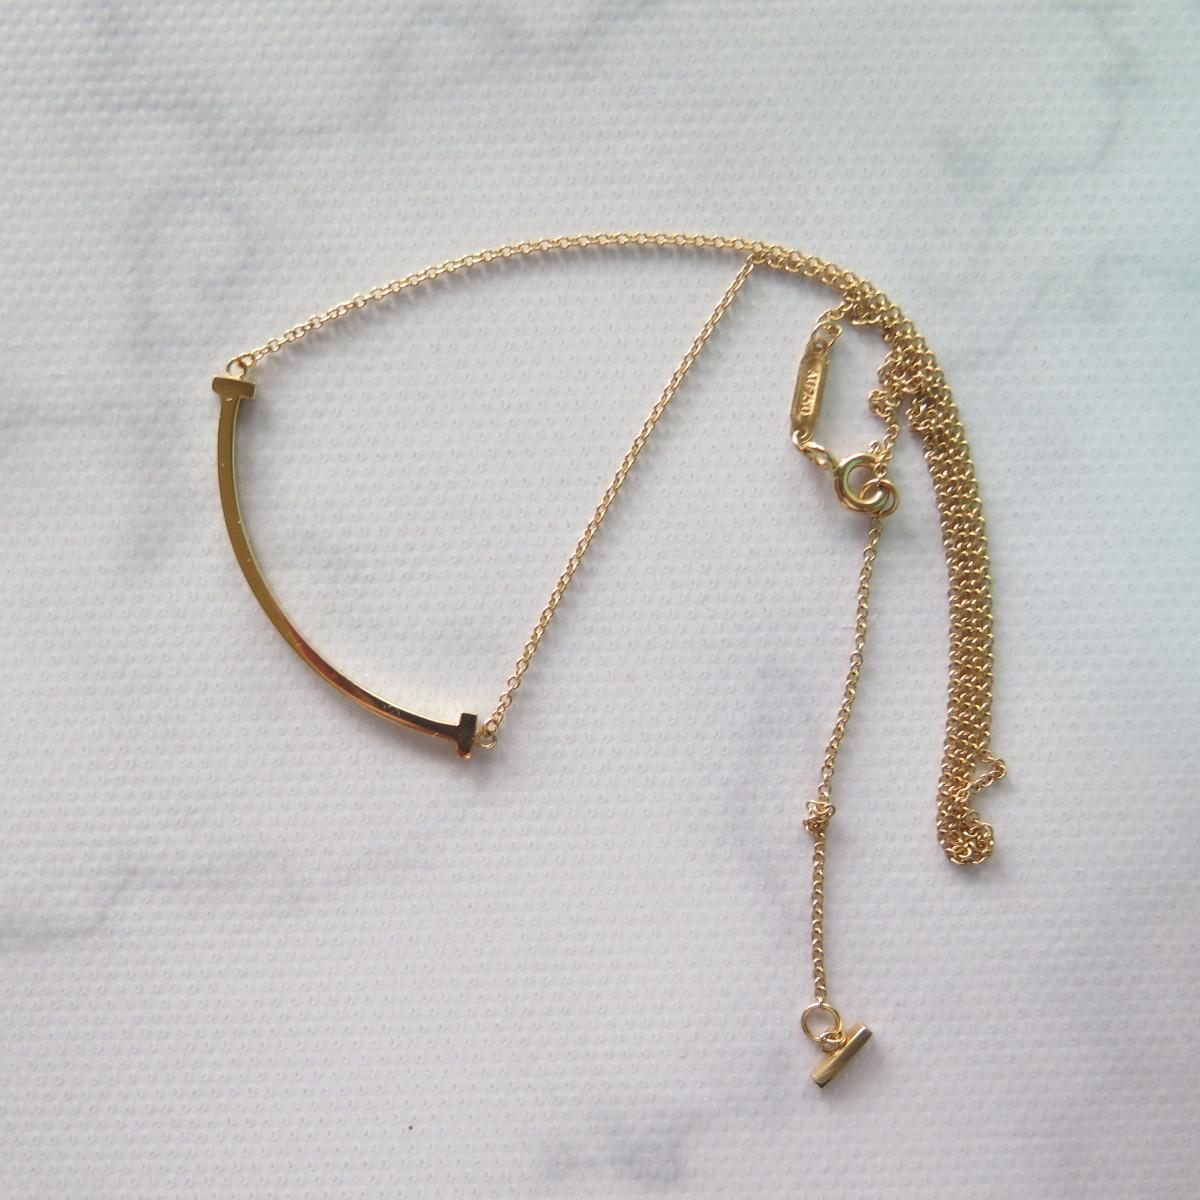 reputable site 636e6 4cbae ティファニー ネックレス T スマイル ペンダント K18 Au750刻 Tiffany&Co.